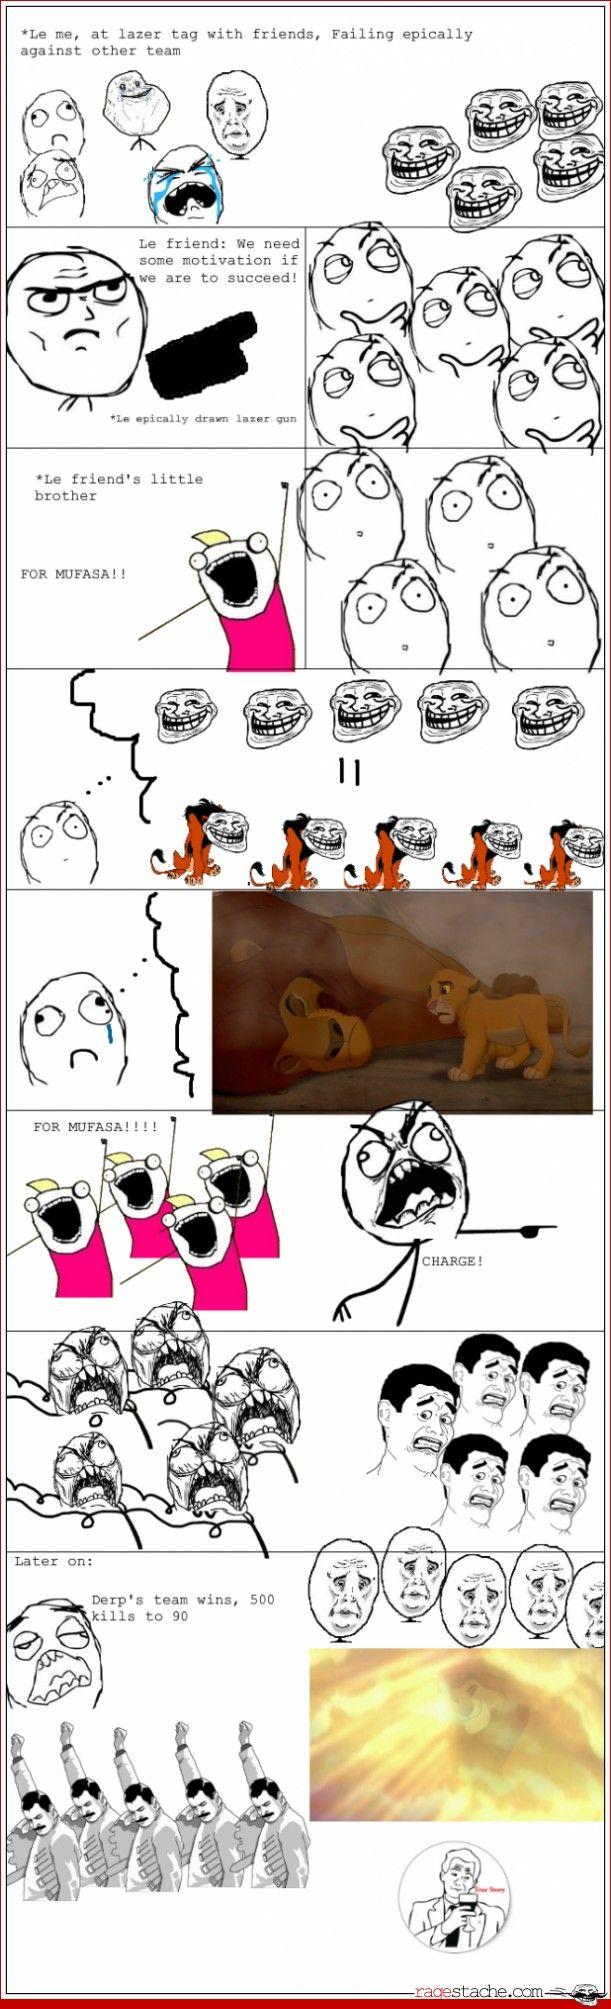 Mufasa the perfect reason to win